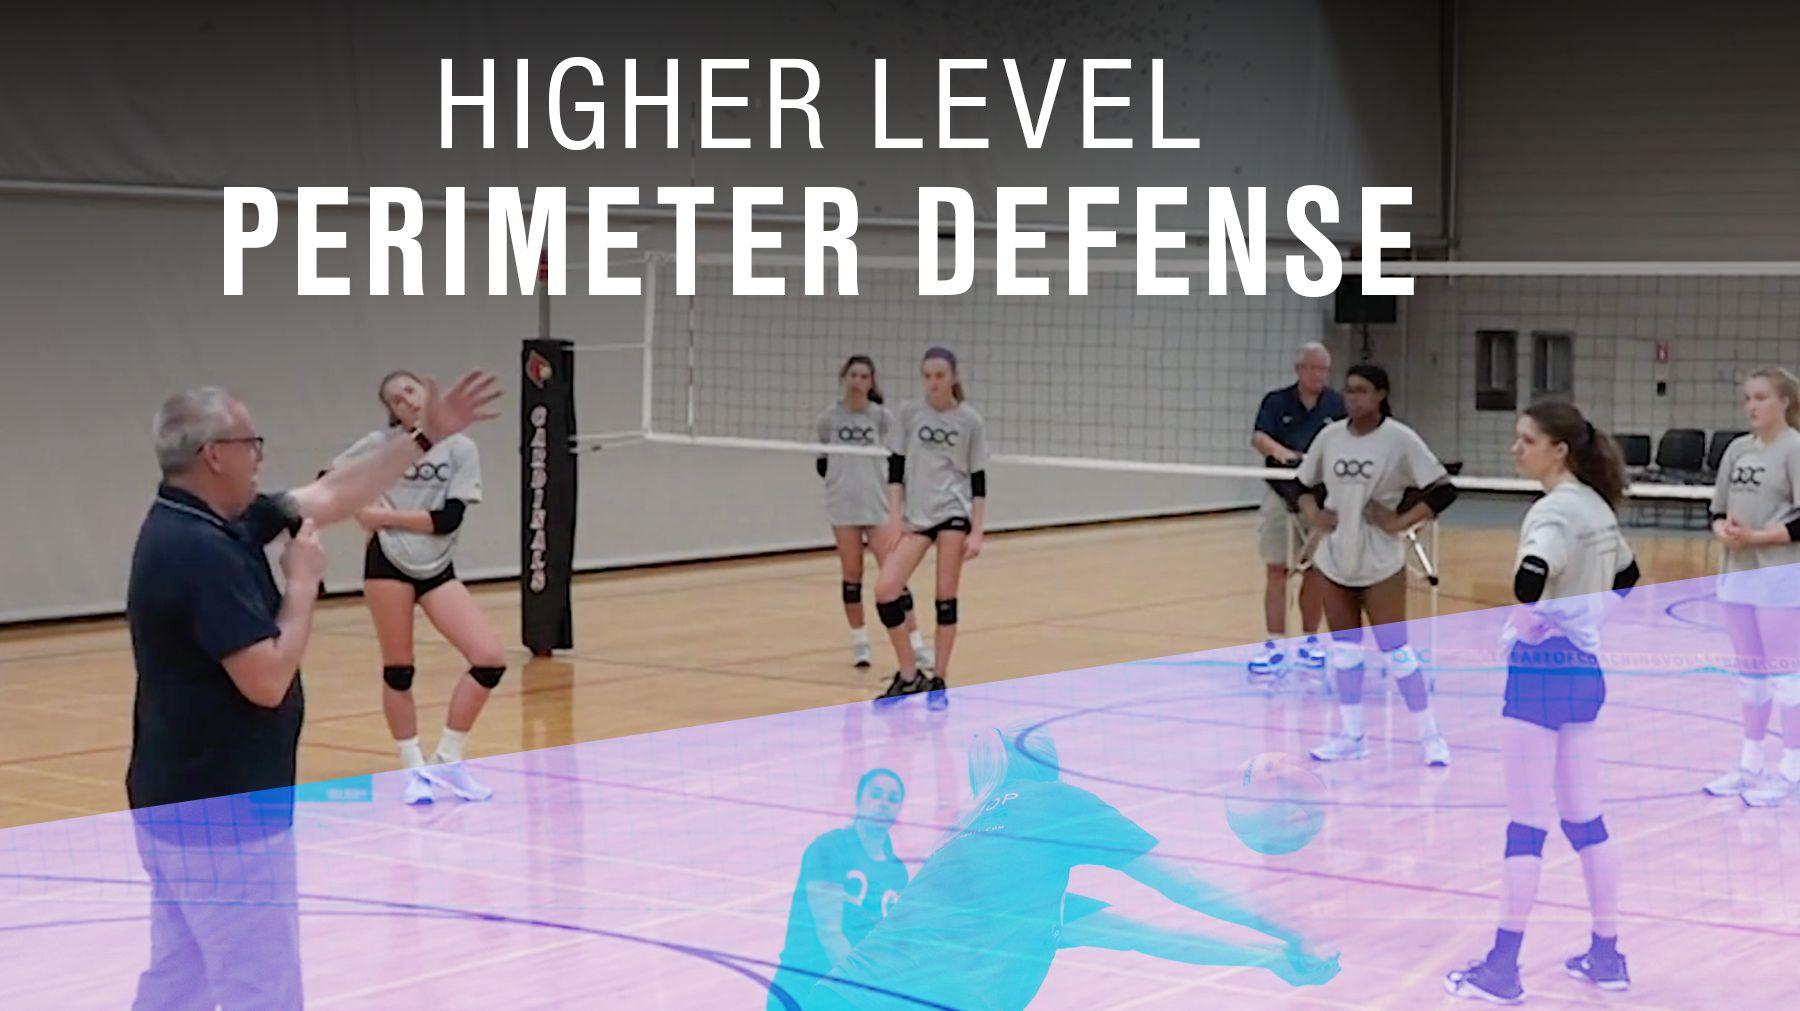 Higher Level Perimeter Defense Coaching Volleyball Volleyball Volleyball Drills